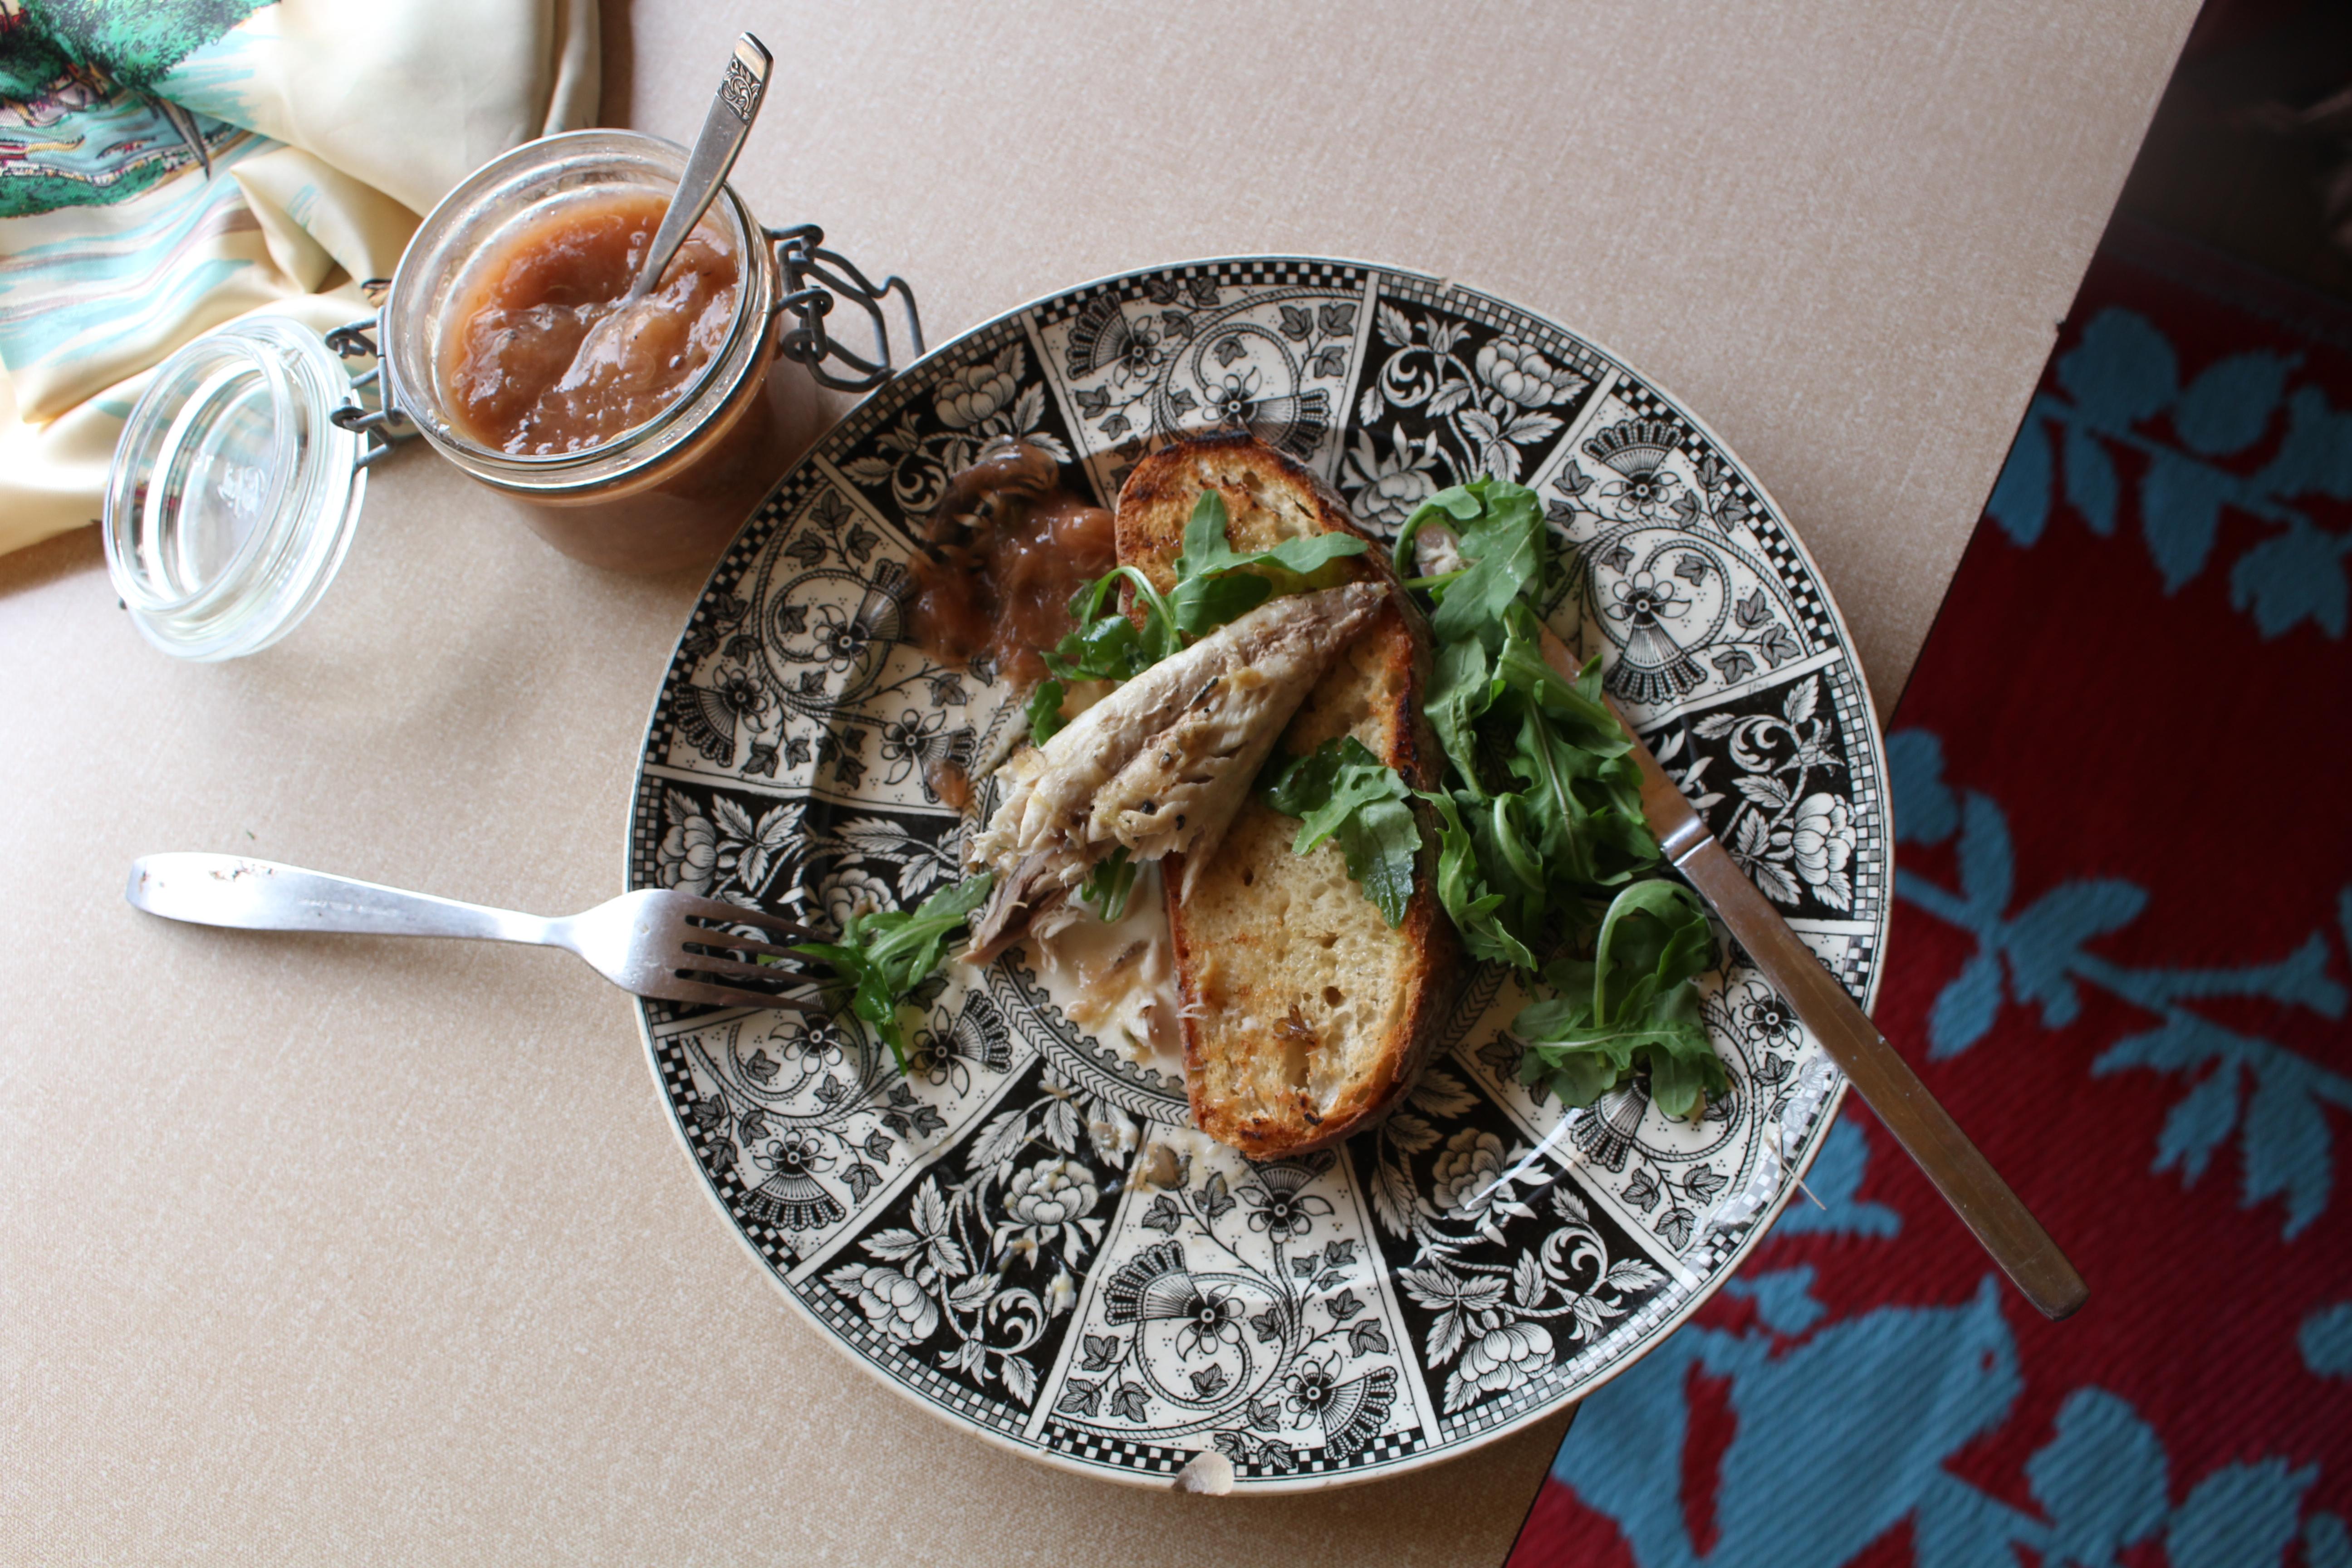 Beachhutcook's Mackerel with Rhubarb Sauce